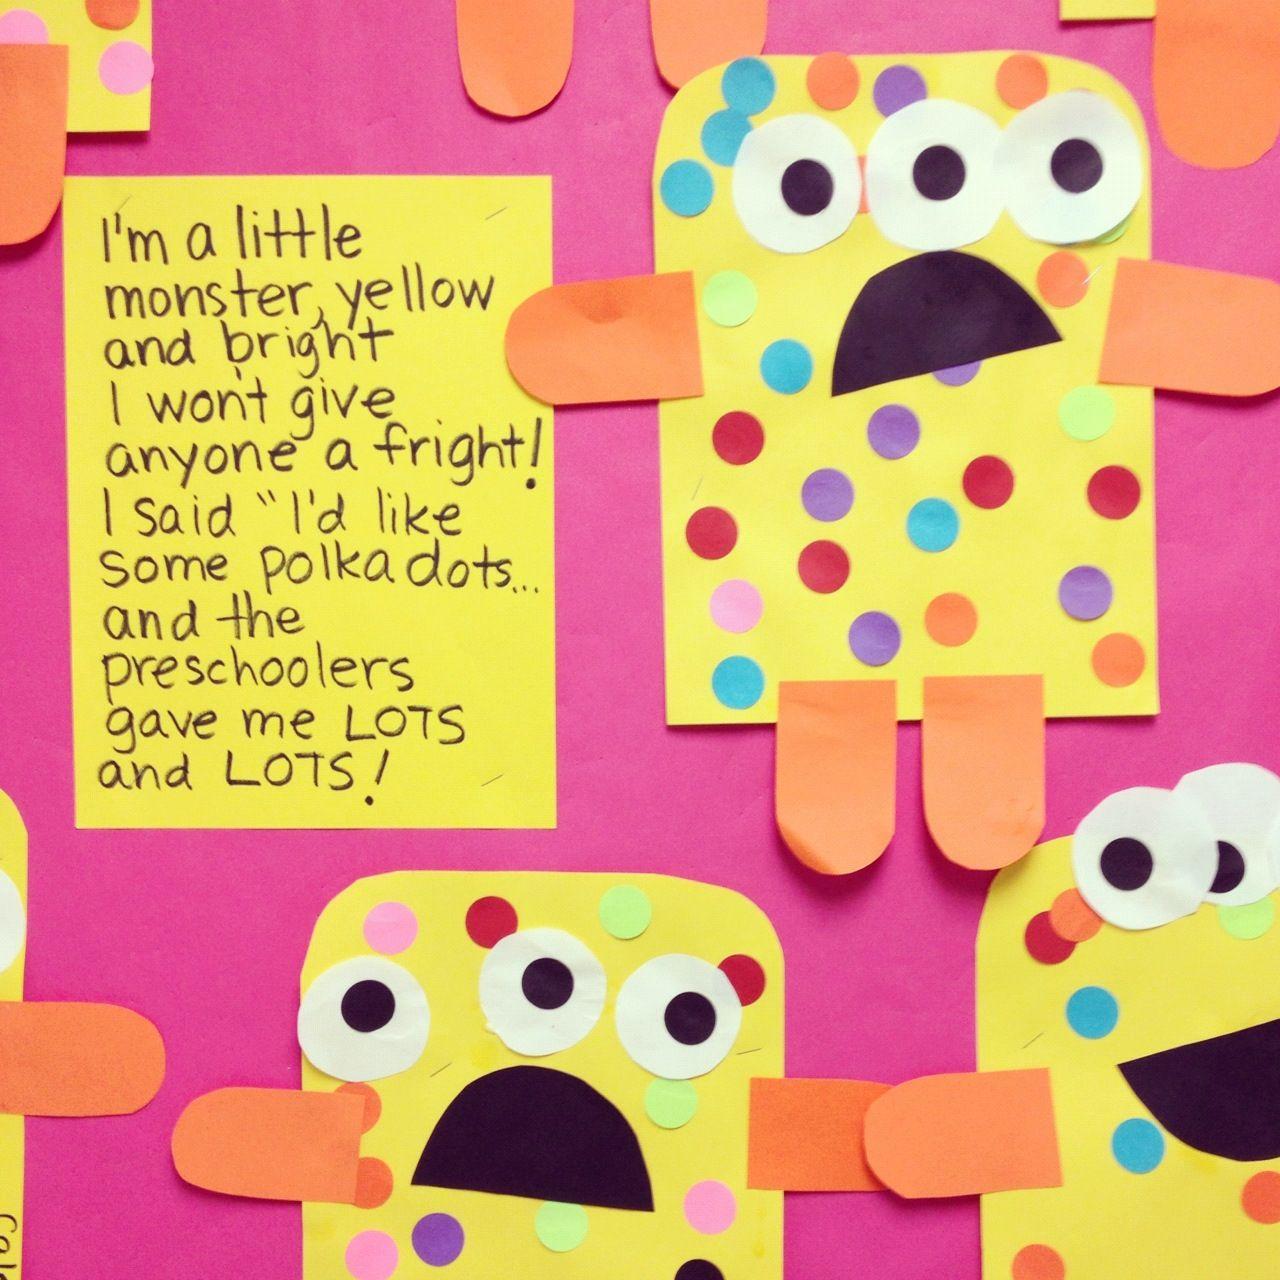 Preschool Monsters